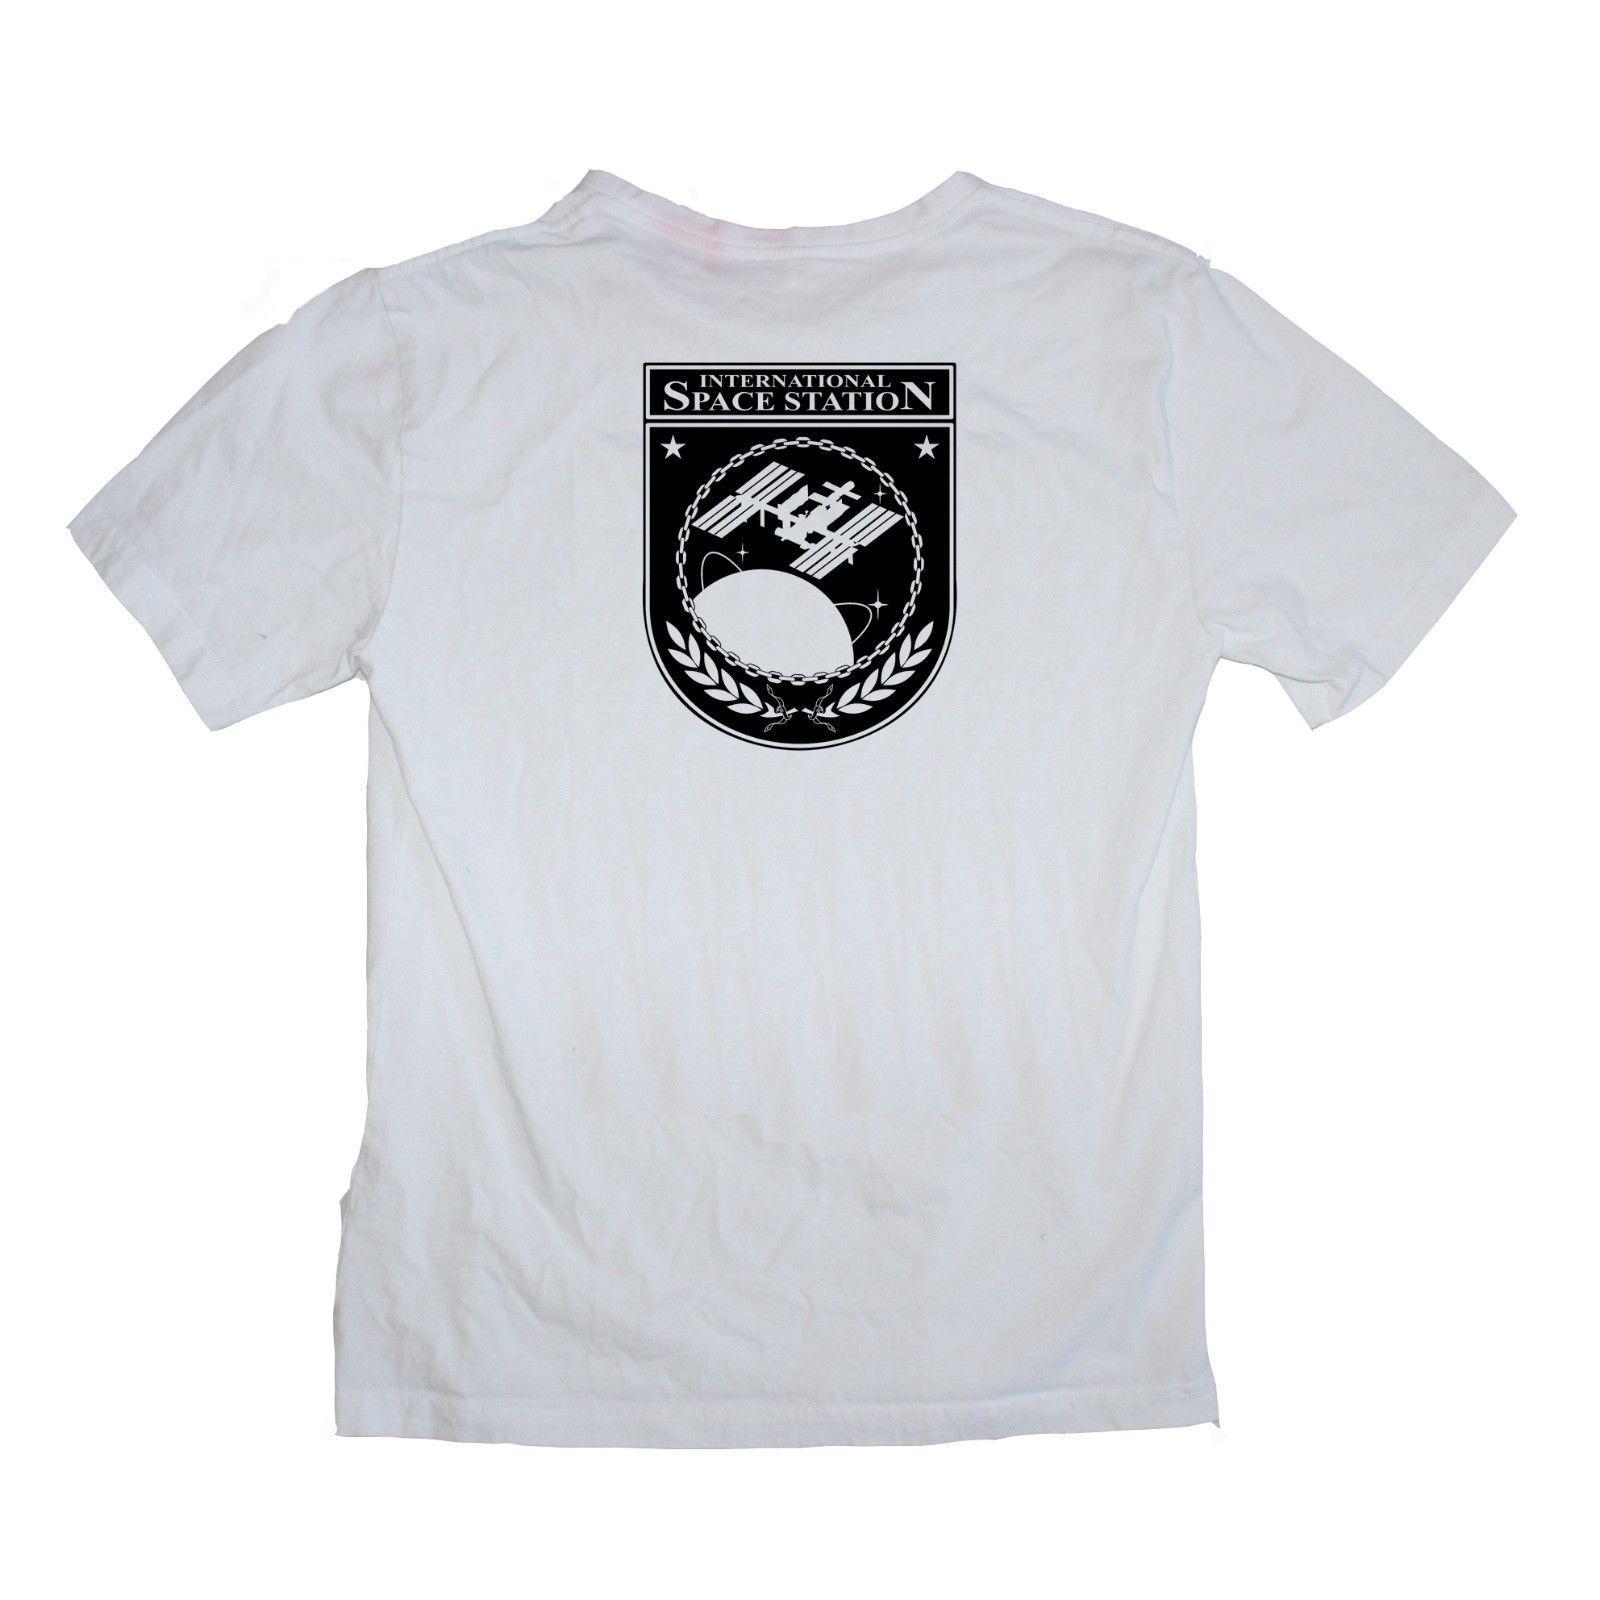 96efded3d Compre ISS International Space Station NASA Camiseta Niños Tallas S XXXL  Muchos Colores A  11.01 Del Geckotees